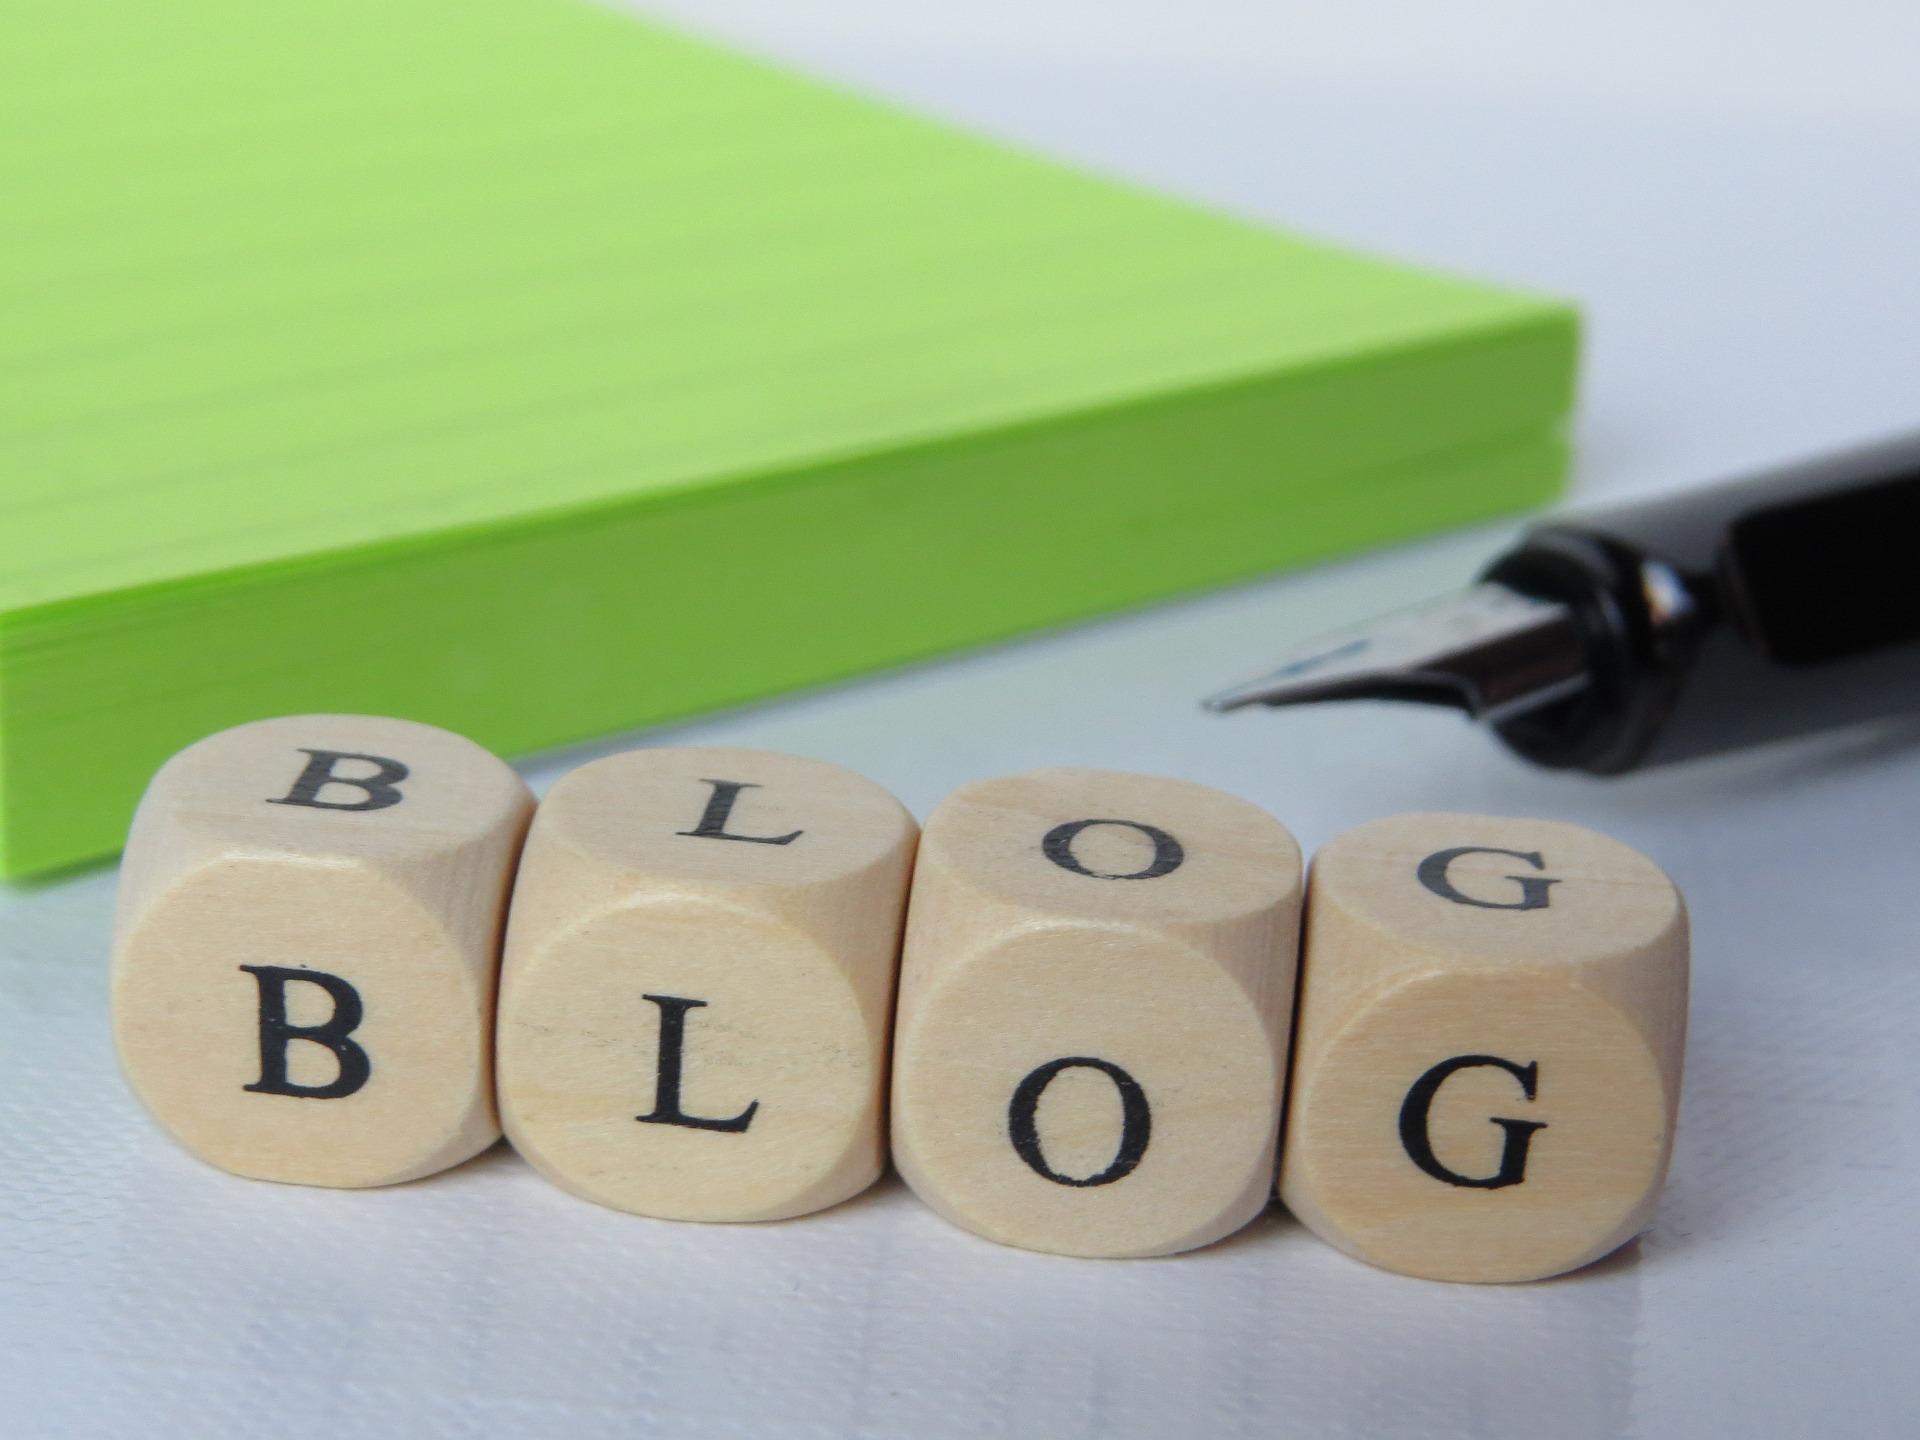 Métier de blogueuse - animer un blog